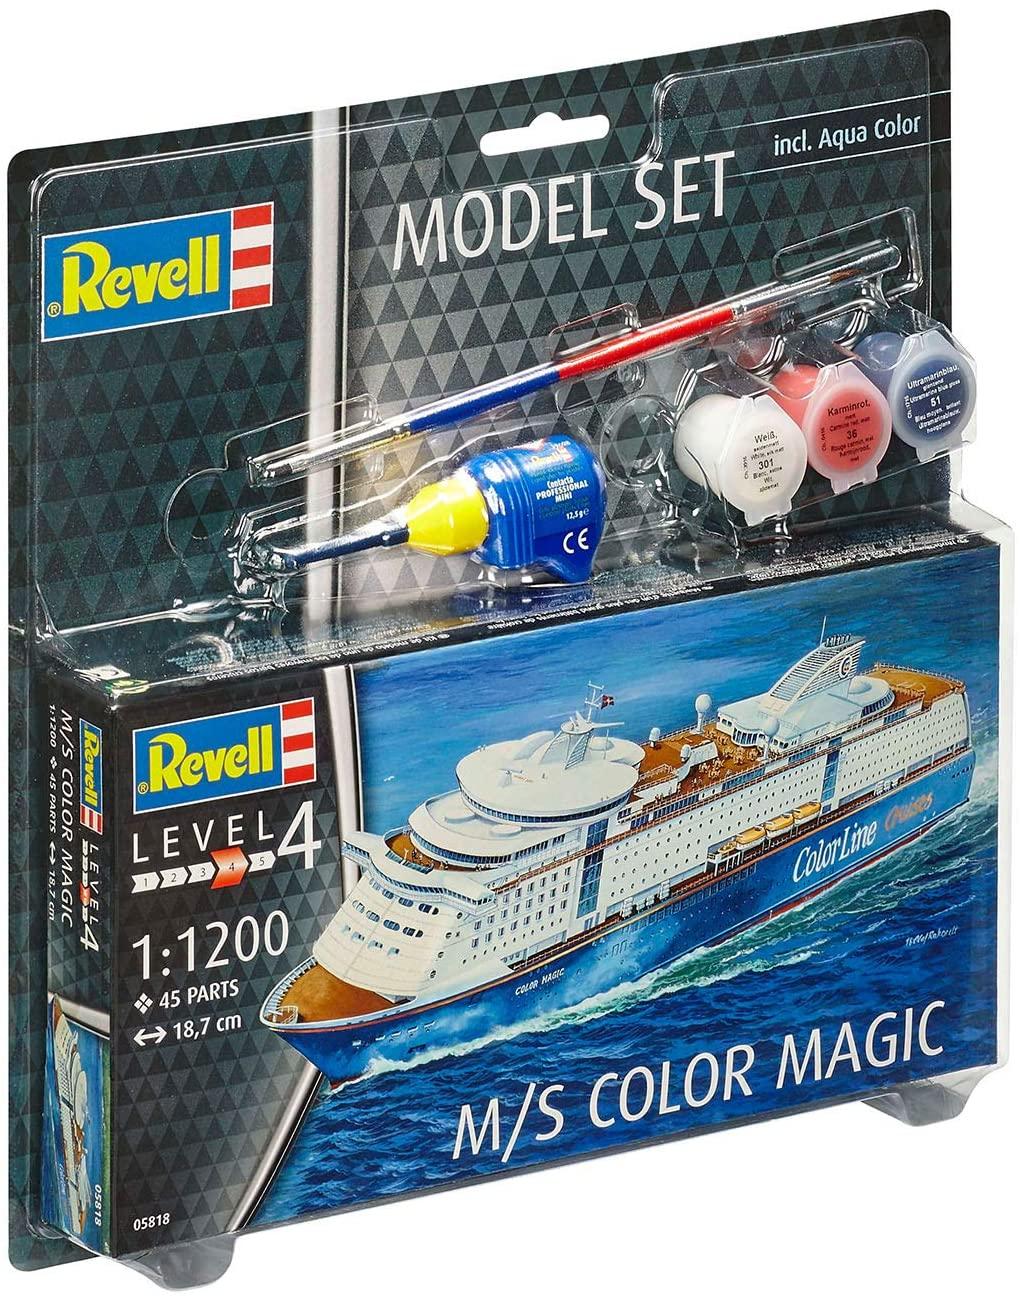 Model Set M/S Color Magic - 1/1200 - Revell 65818  - BLIMPS COMÉRCIO ELETRÔNICO